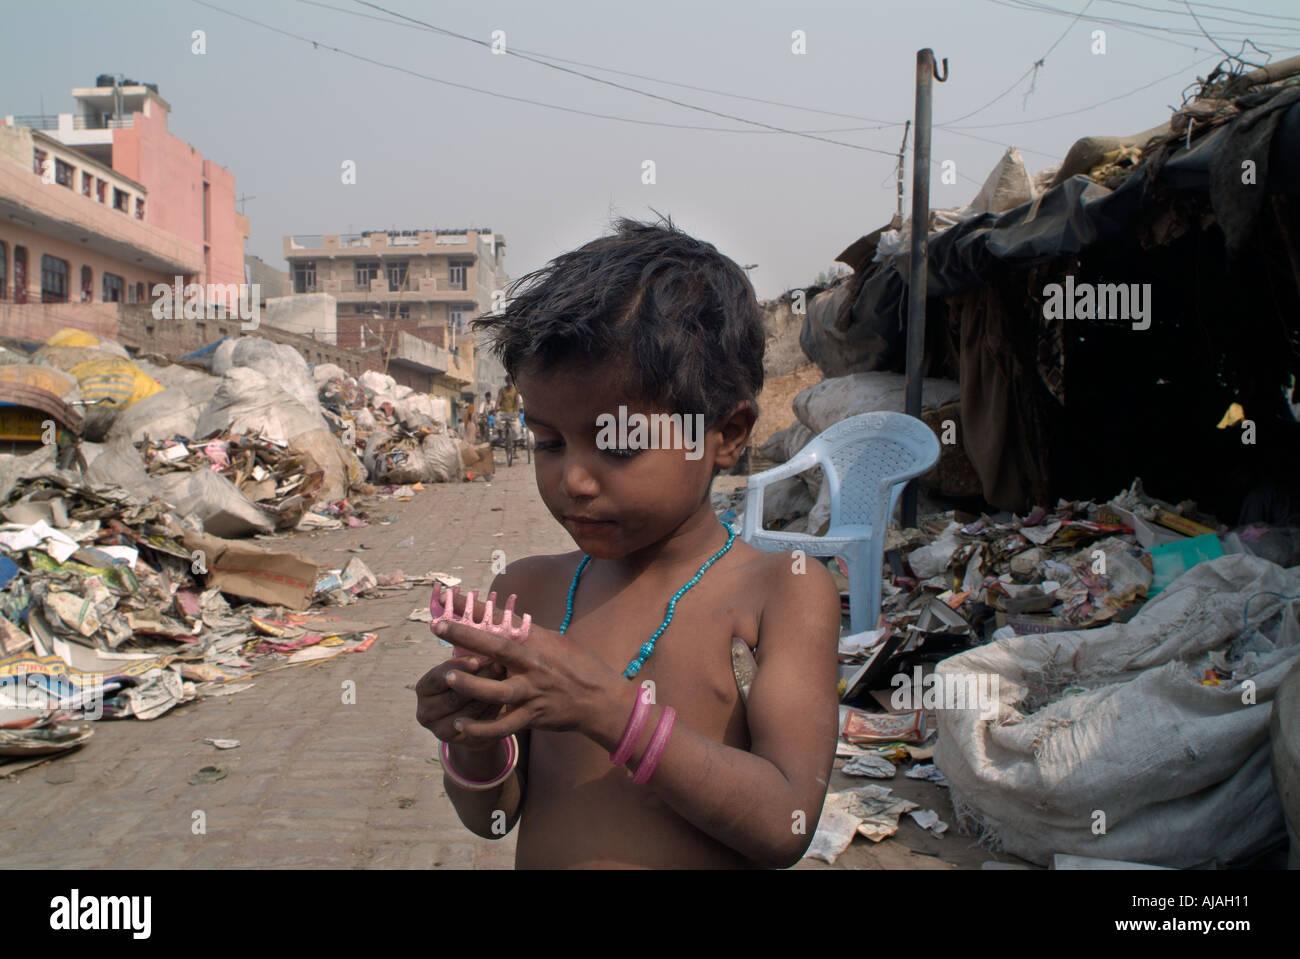 rag pickers in india essay Studies on the solid waste collection by rag pickers at greater hyderabad municipal corporation, india kuruva syamala devi 1 , arza vvs swamy 2 , ravuri hema krishna 3.